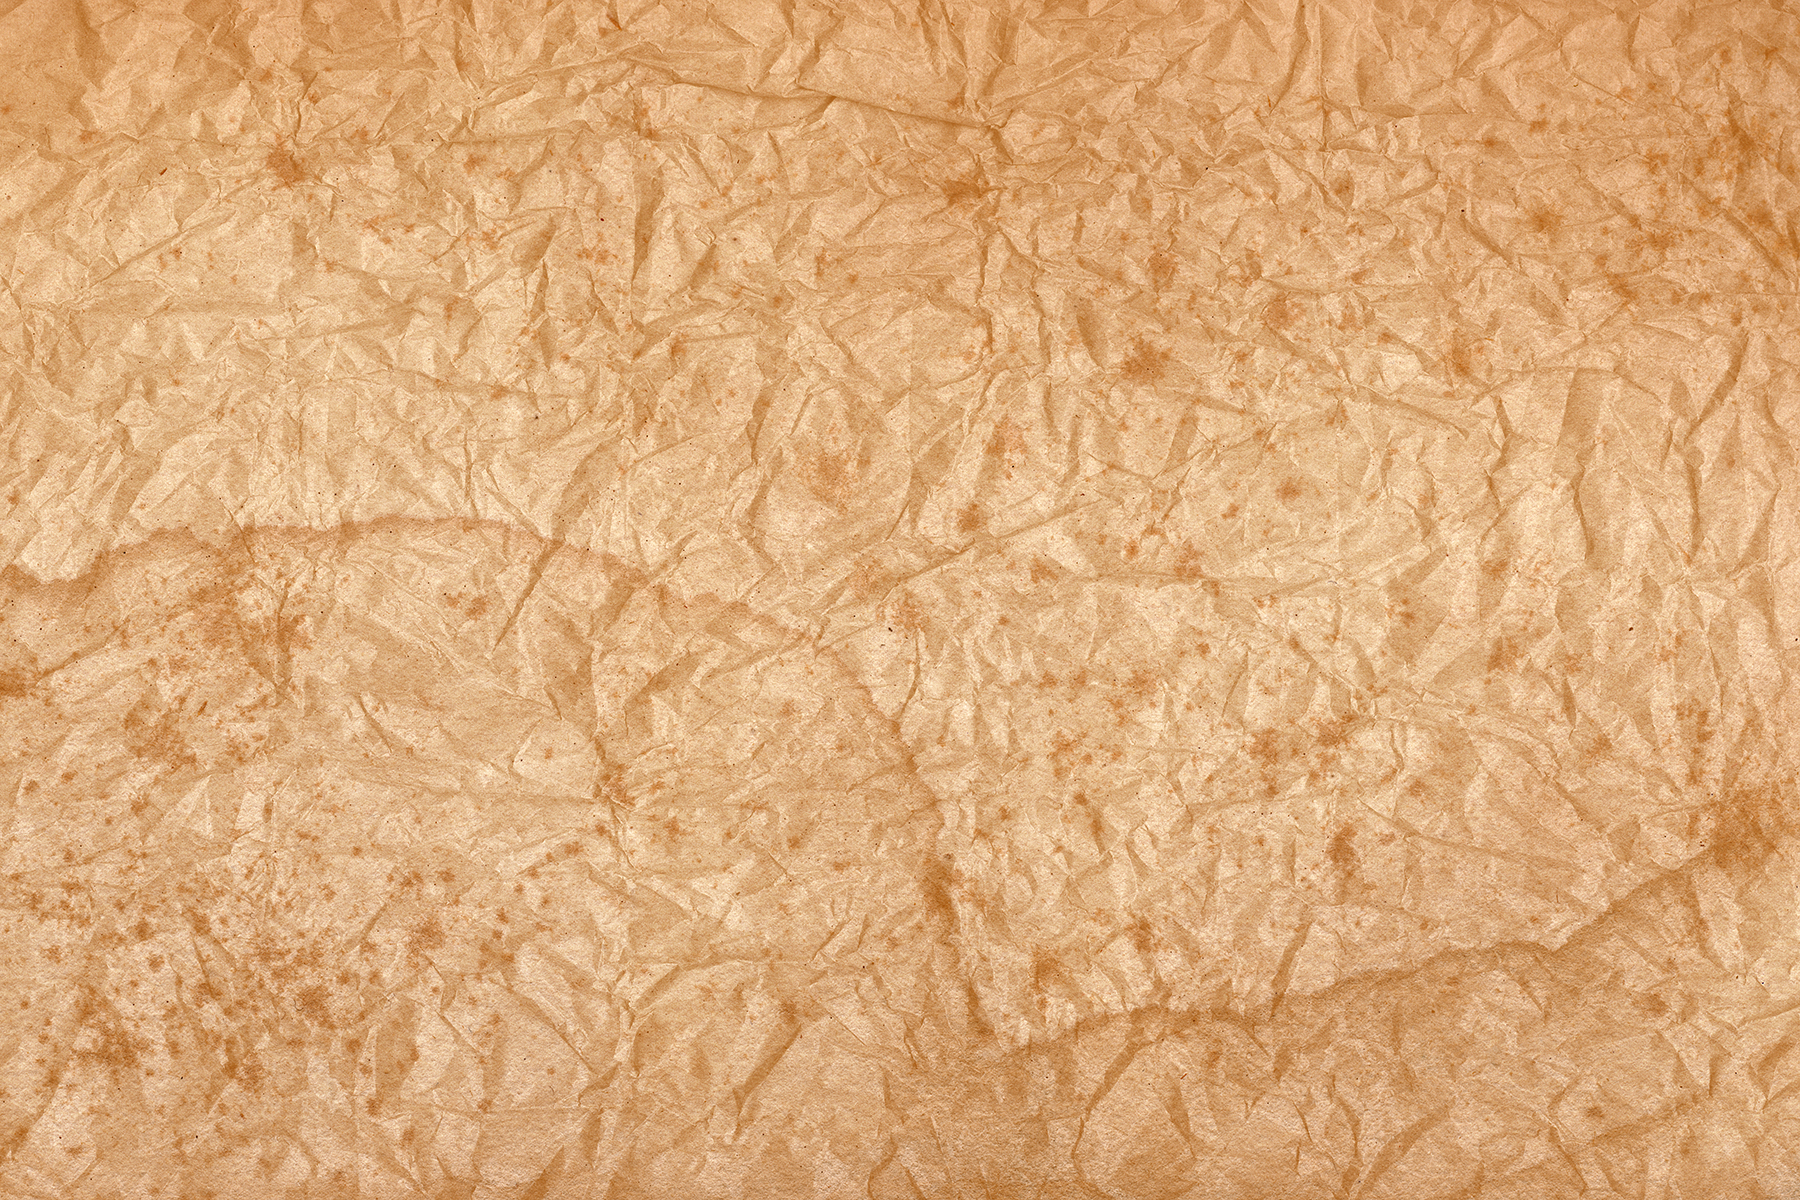 Vintage Crumpled Paper, Age, Paper, Soiled, Soil, HQ Photo